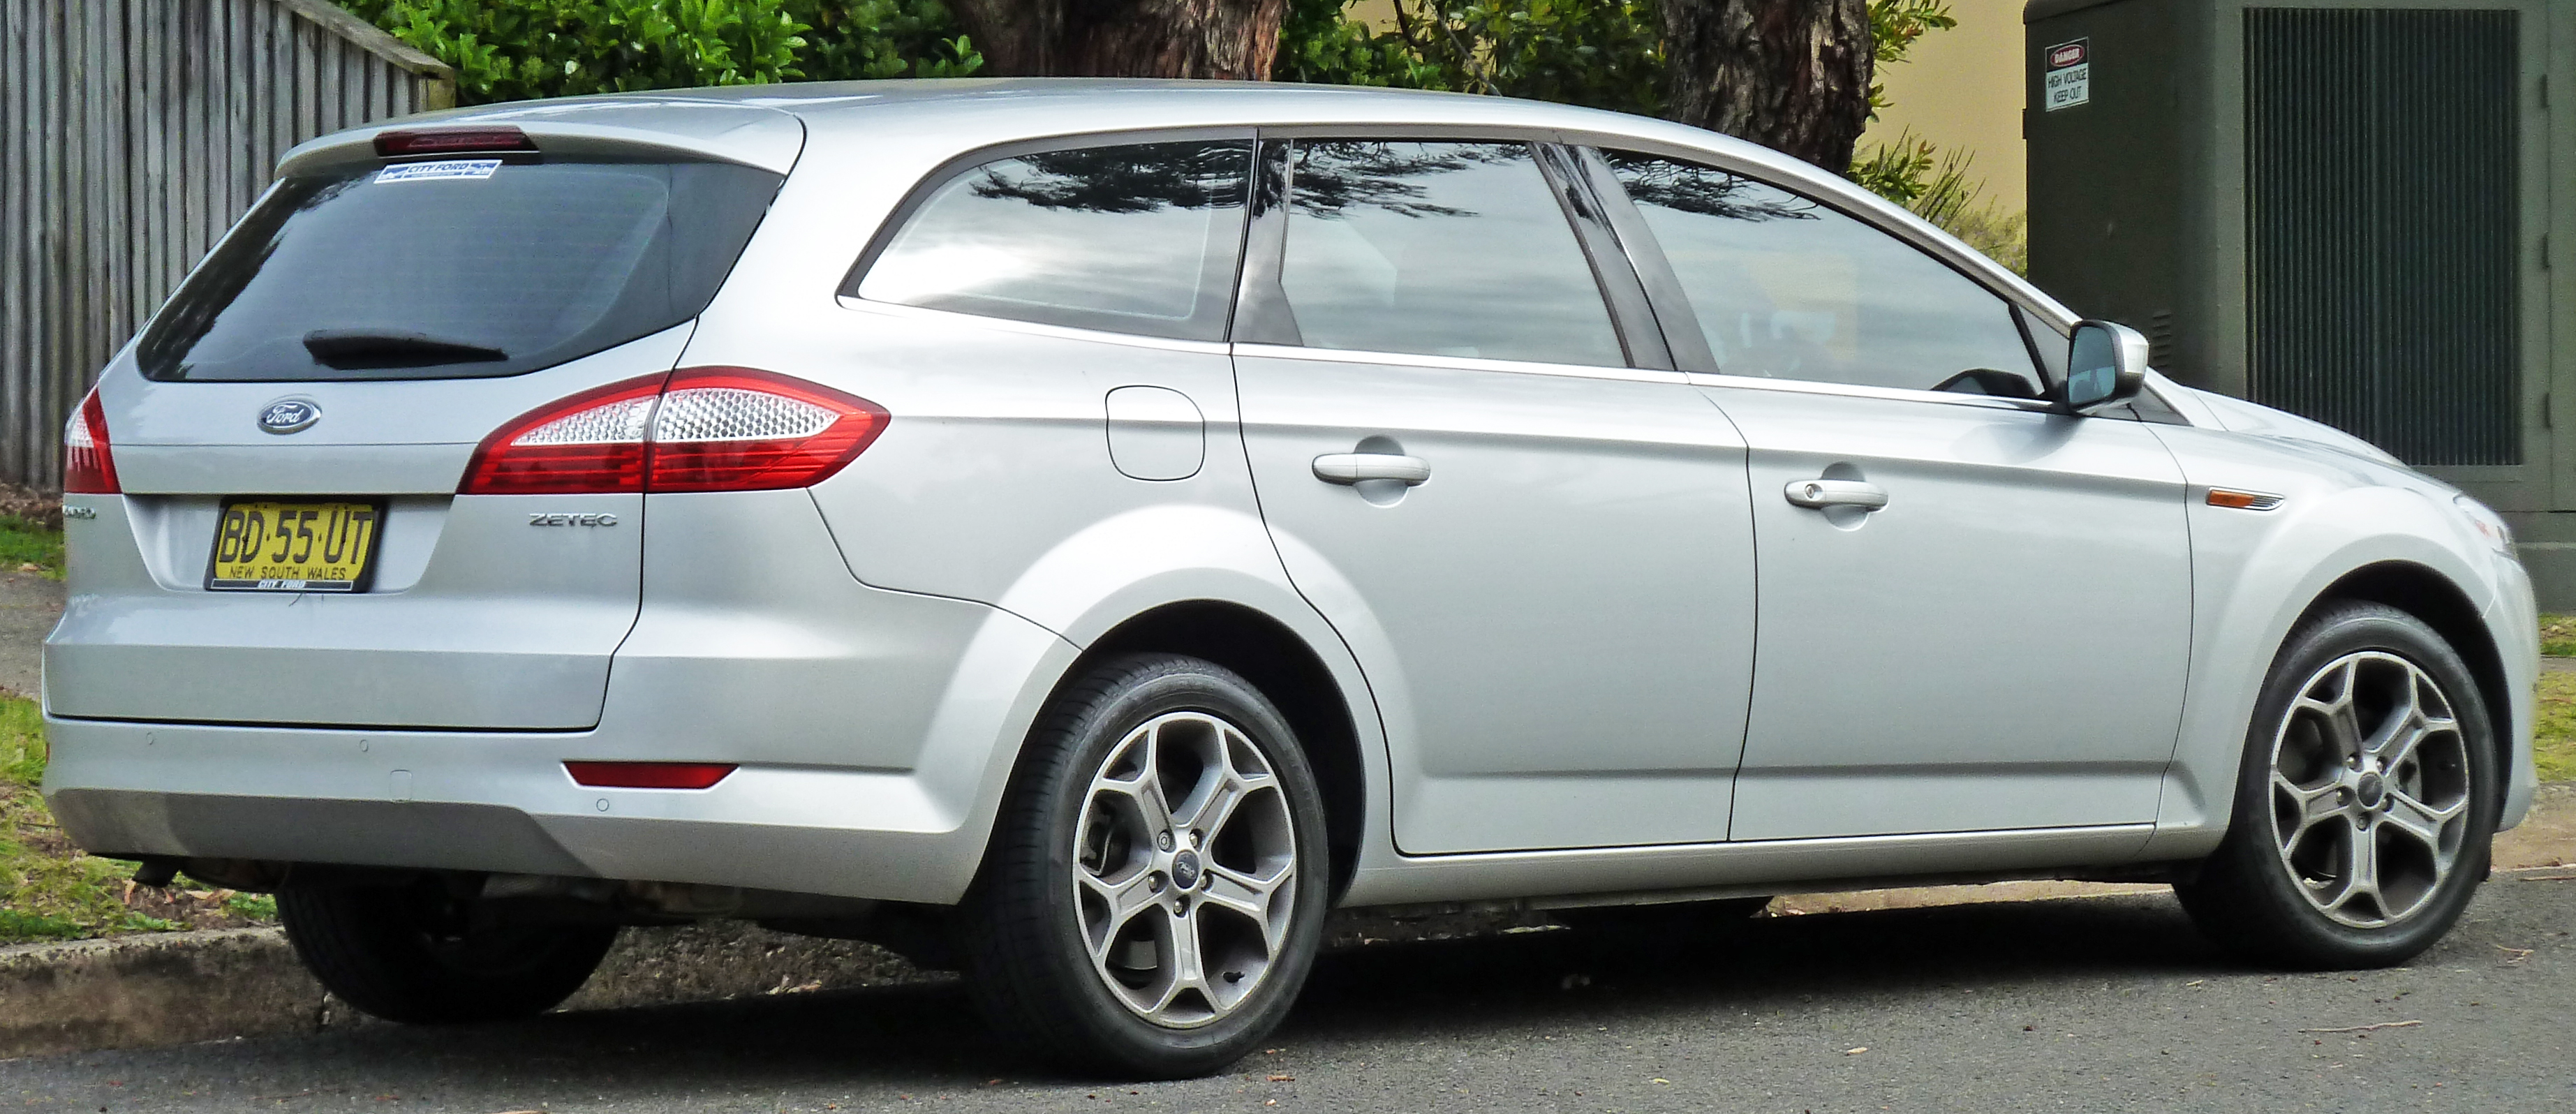 2010 ford mondeo wagon